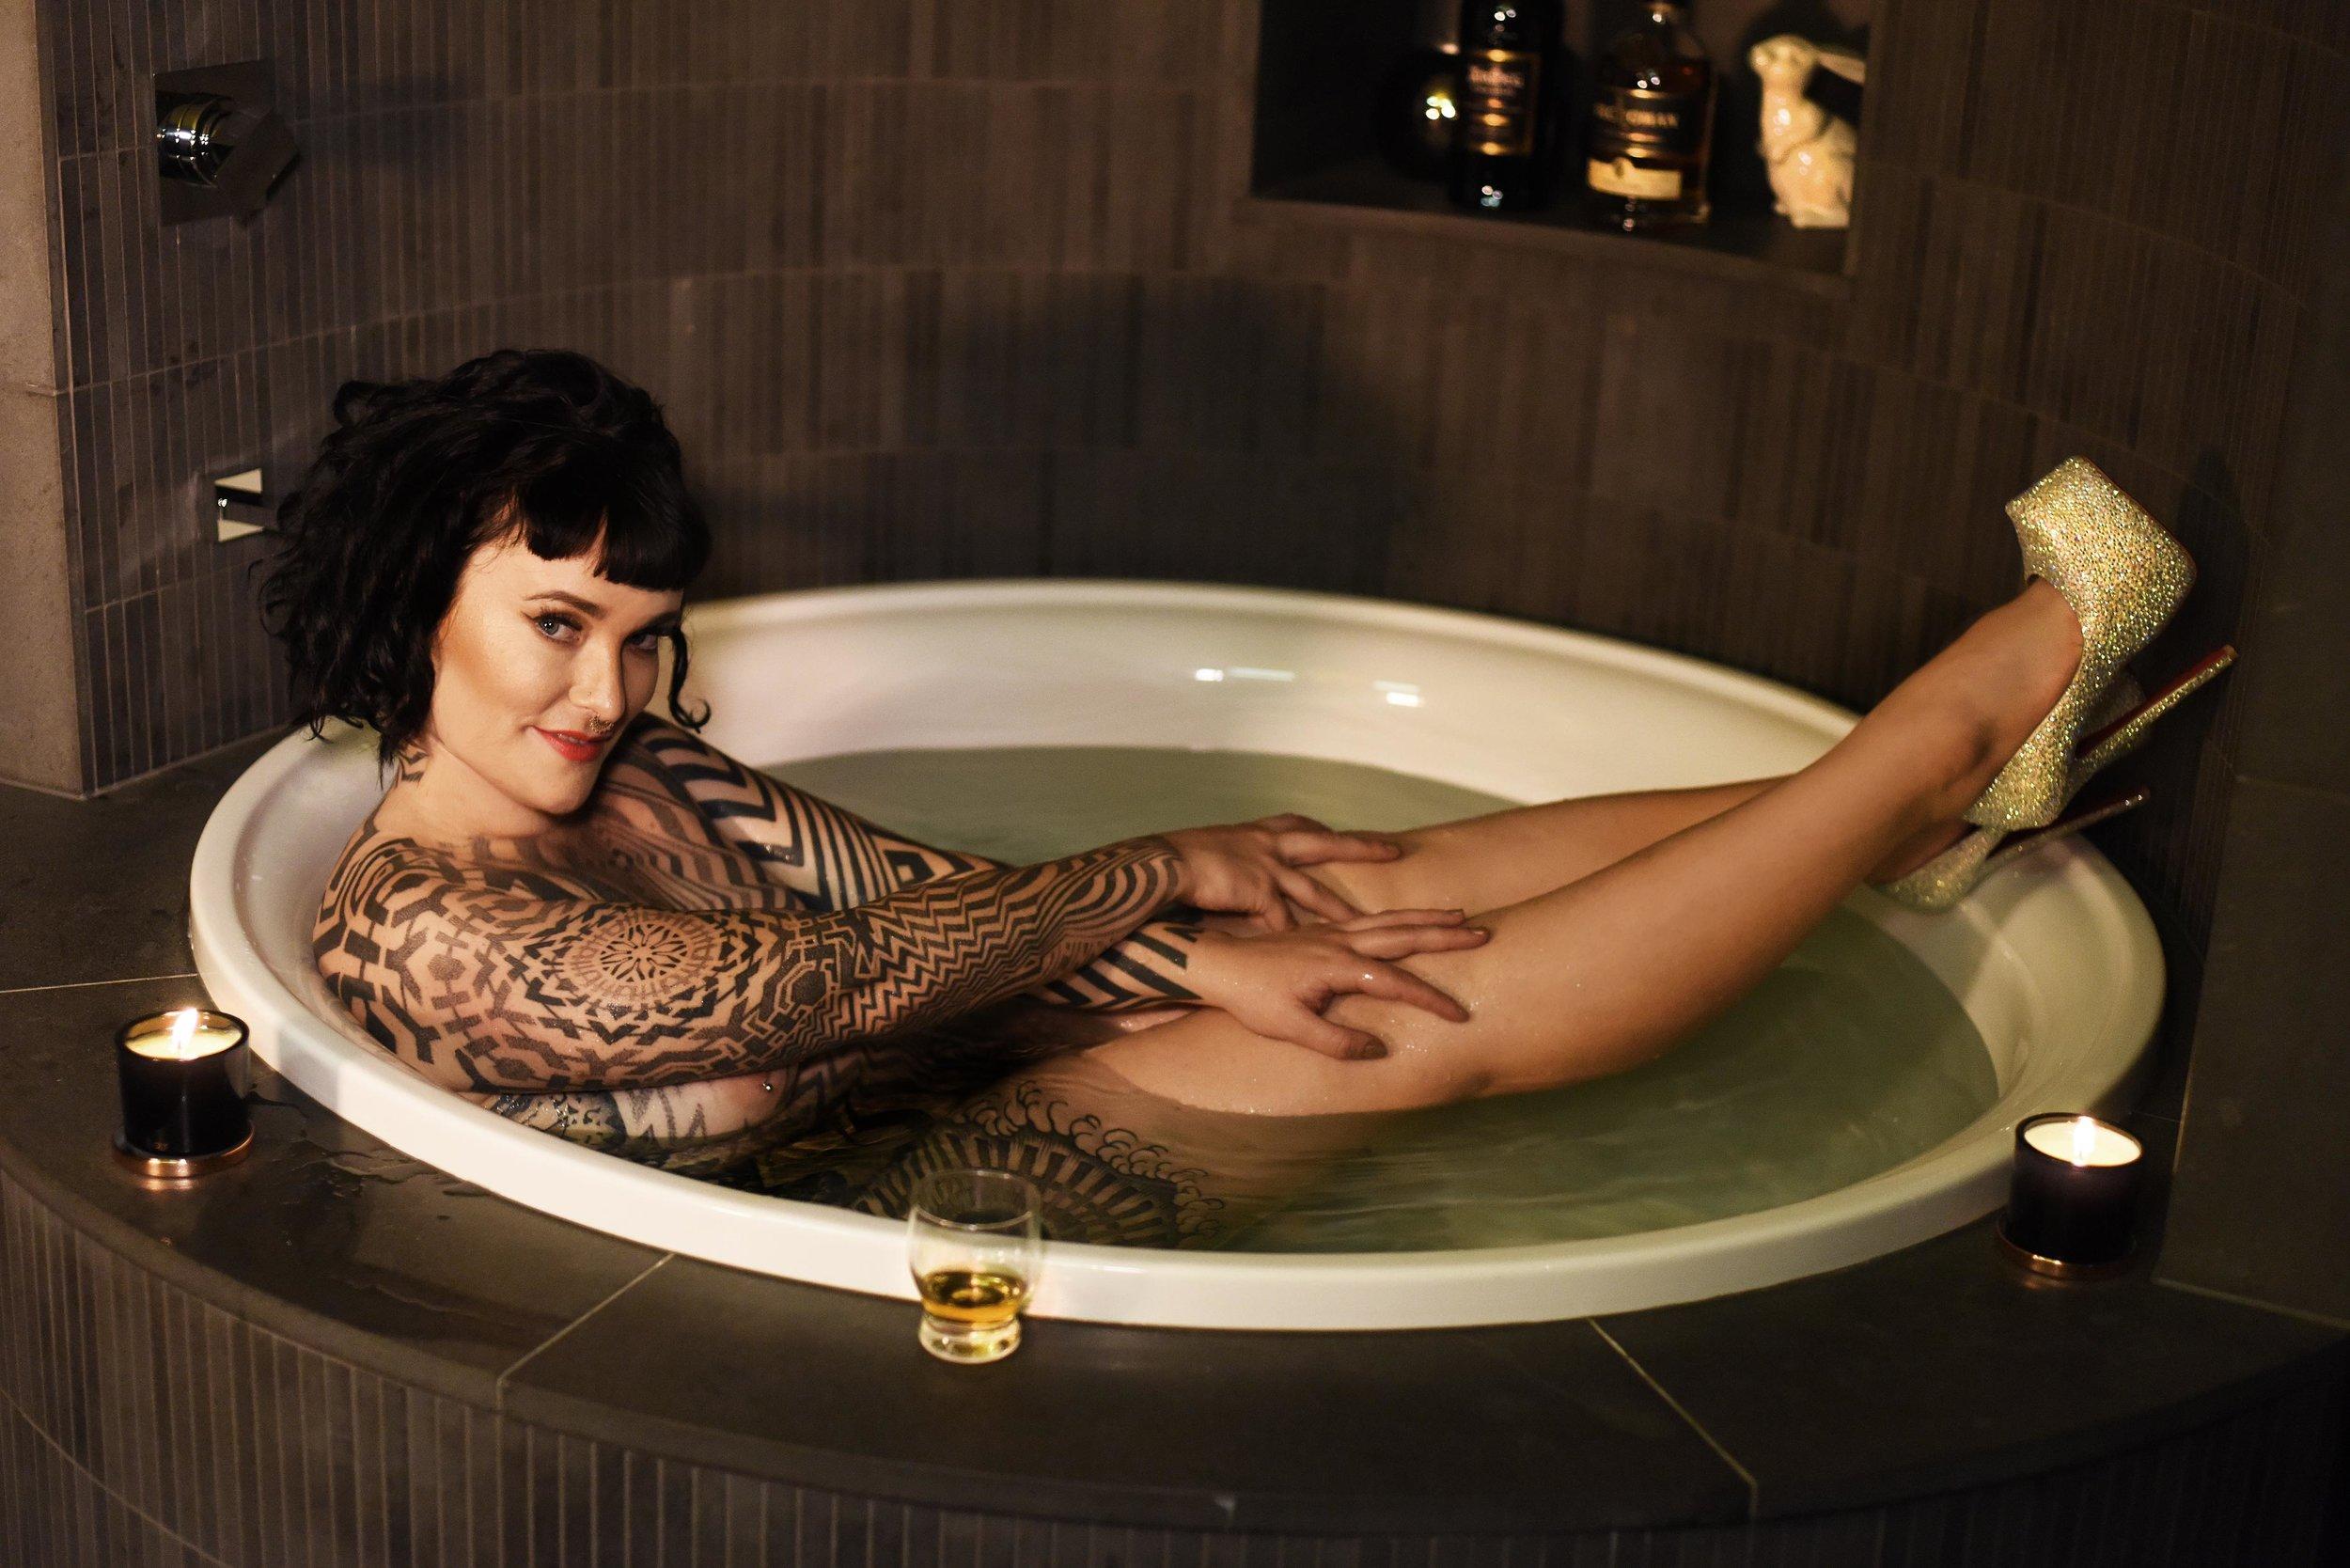 Tallula darling, tattooed escort, kinky escort, whisky mistress, whiskey escort, dominant GFE, fly me to you, extended dates